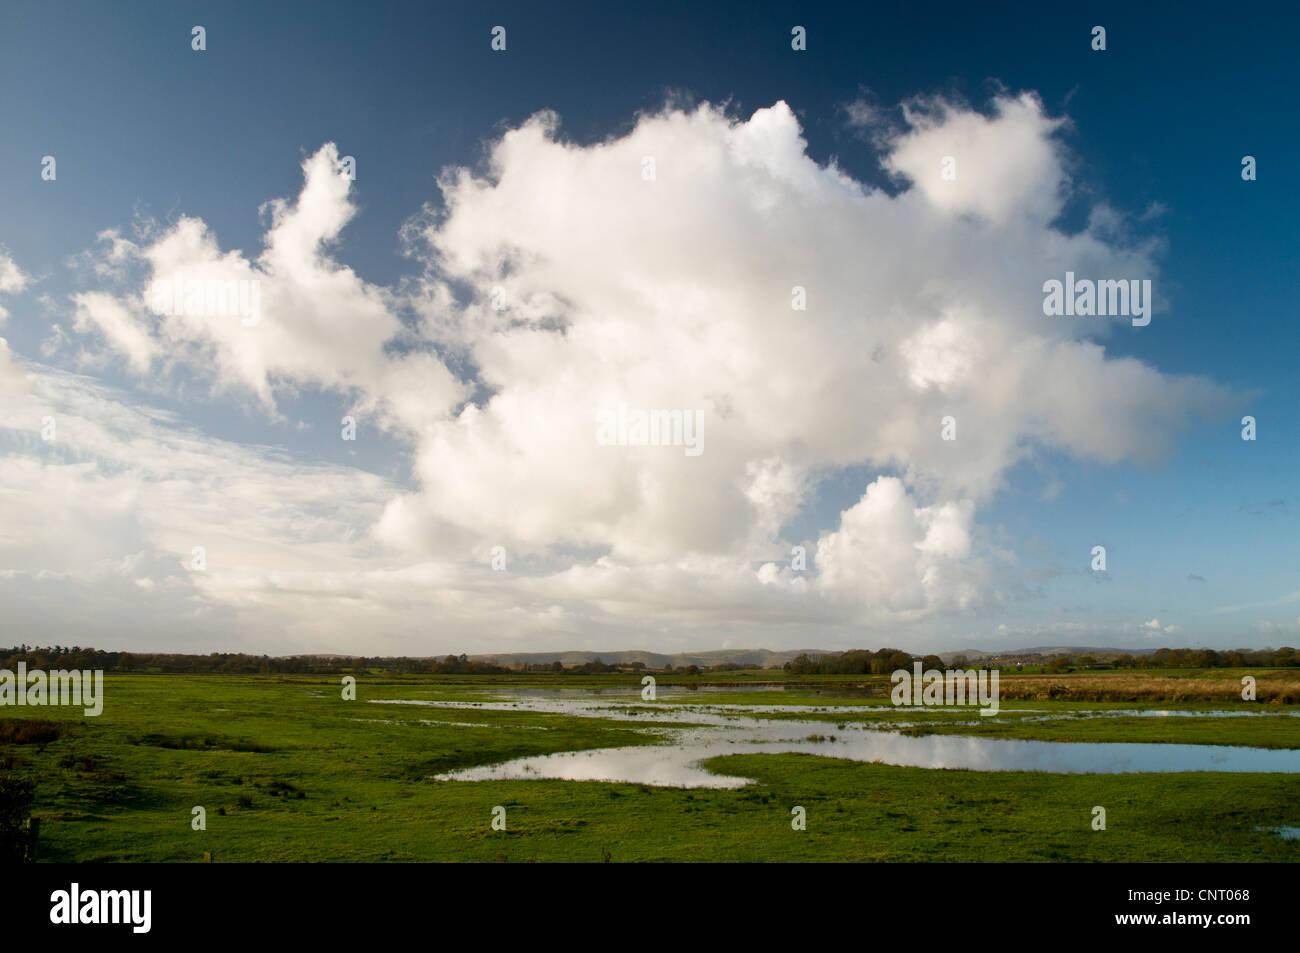 Cumulonimbus cloud formations above wetland habitat at RSPB Pulborough Brooks, West Sussex. November. Stock Photo